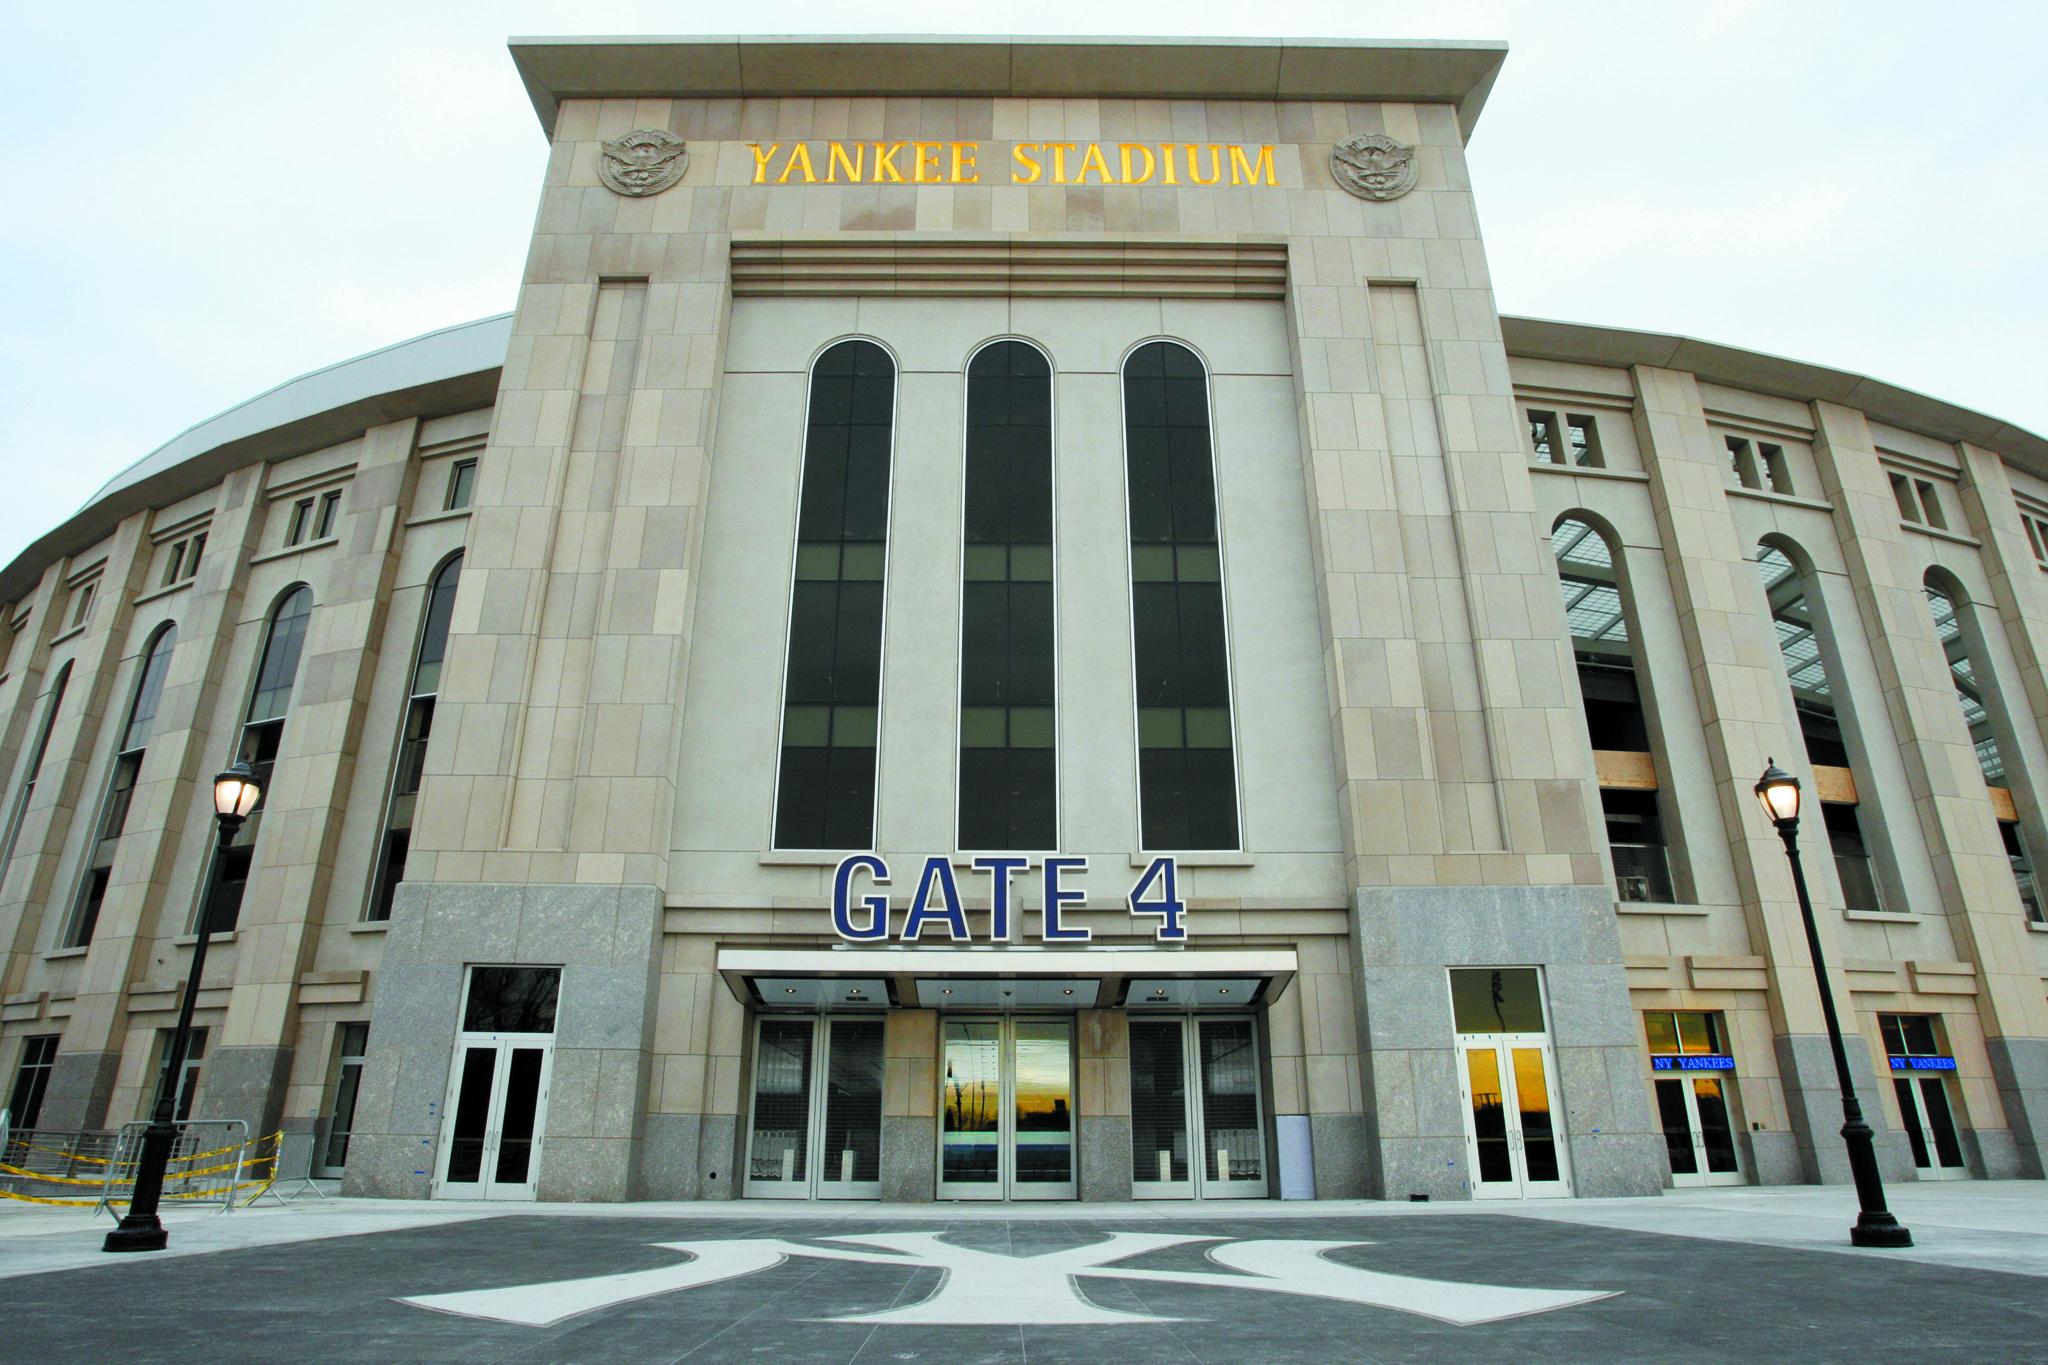 gct.hr.yankee stadium.jpg